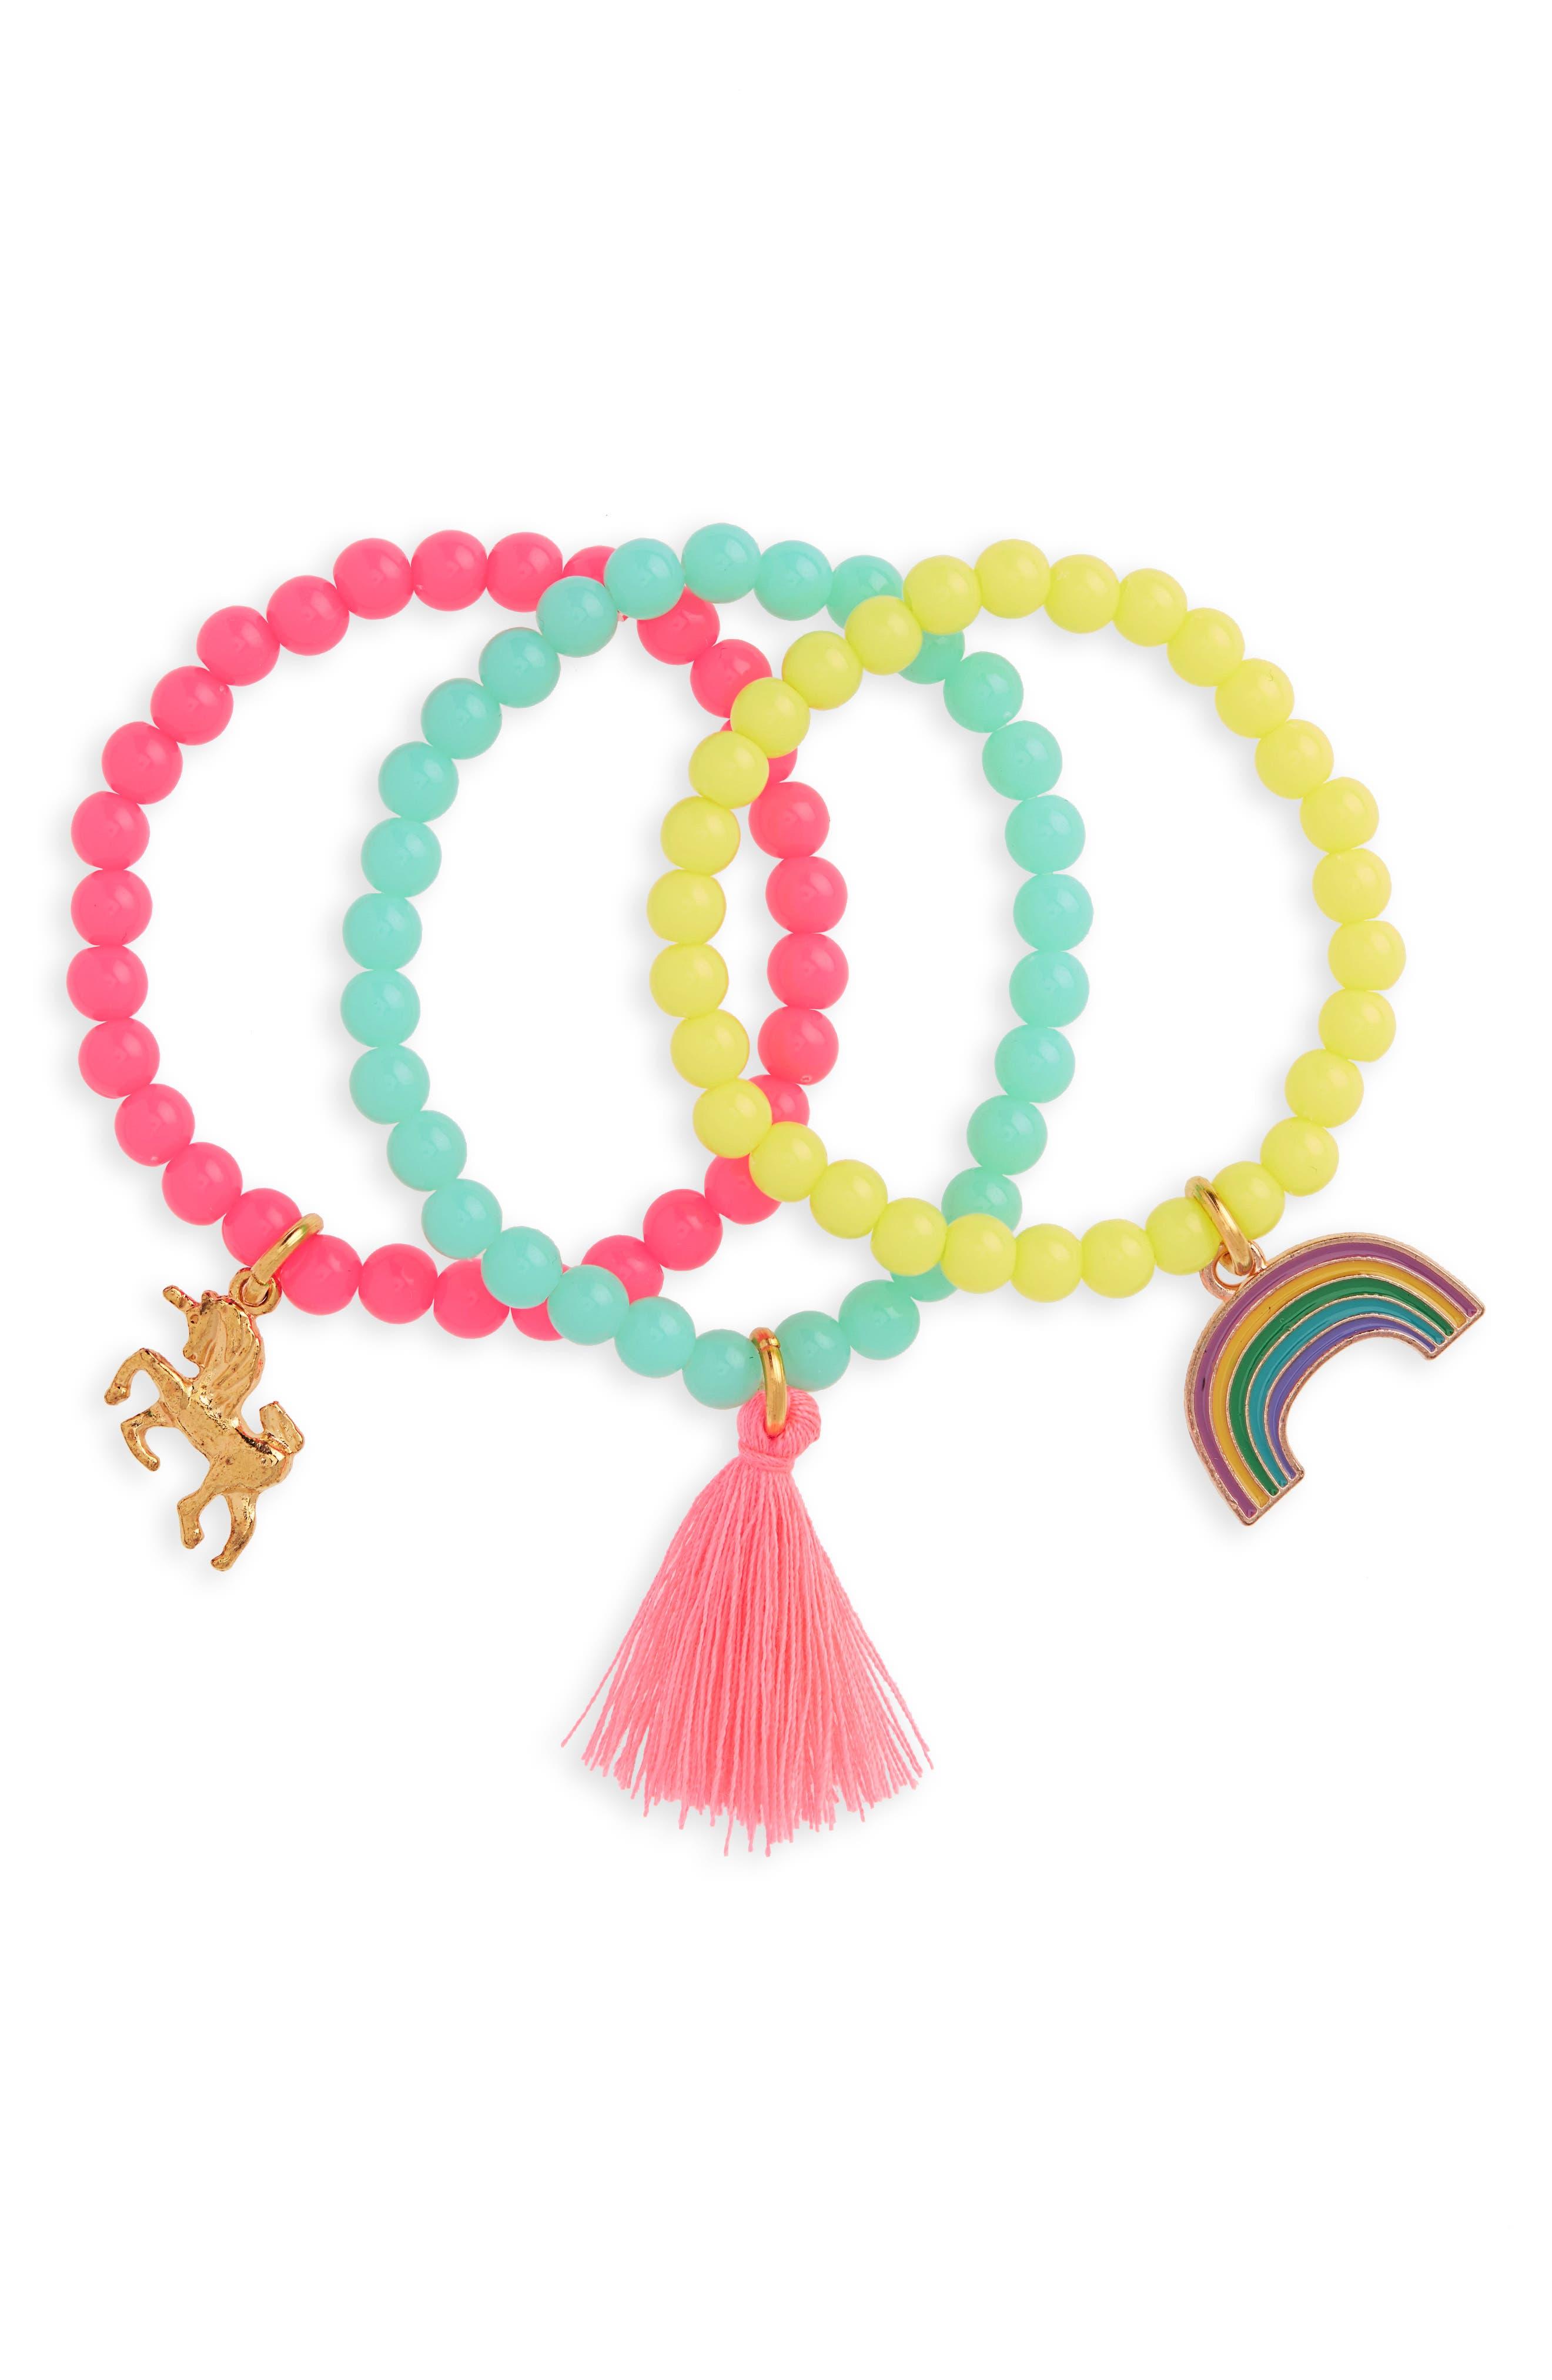 3-Pack Beaded Bracelets,                             Main thumbnail 1, color,                             CORAL